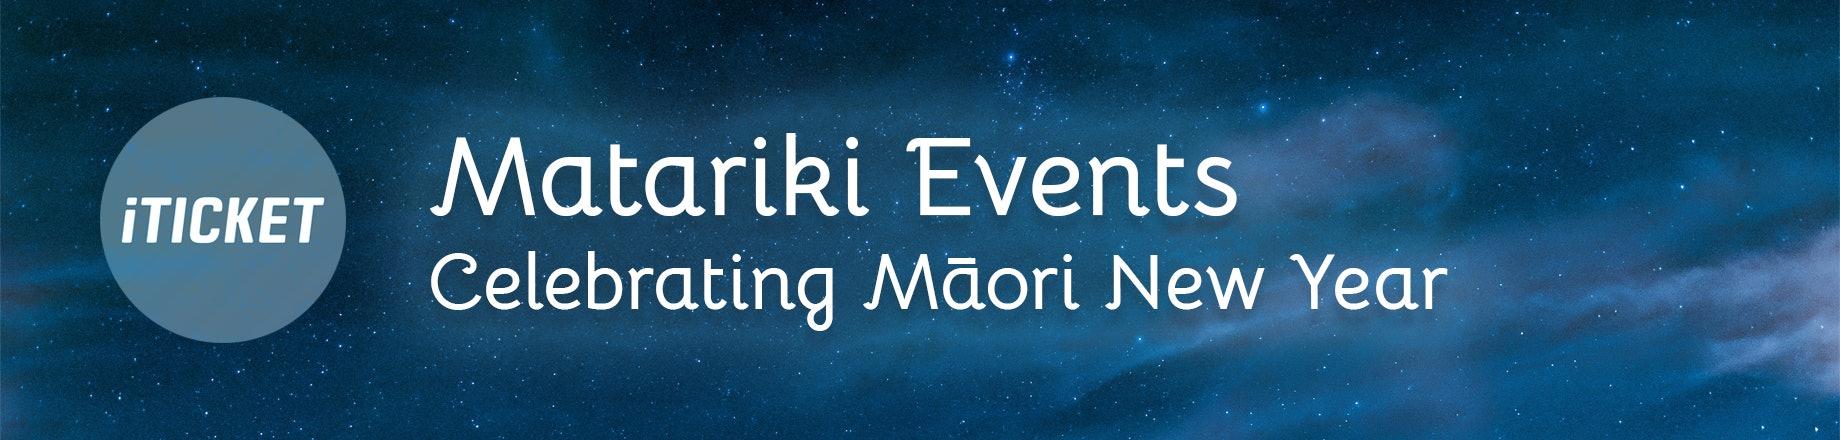 Matariki Events